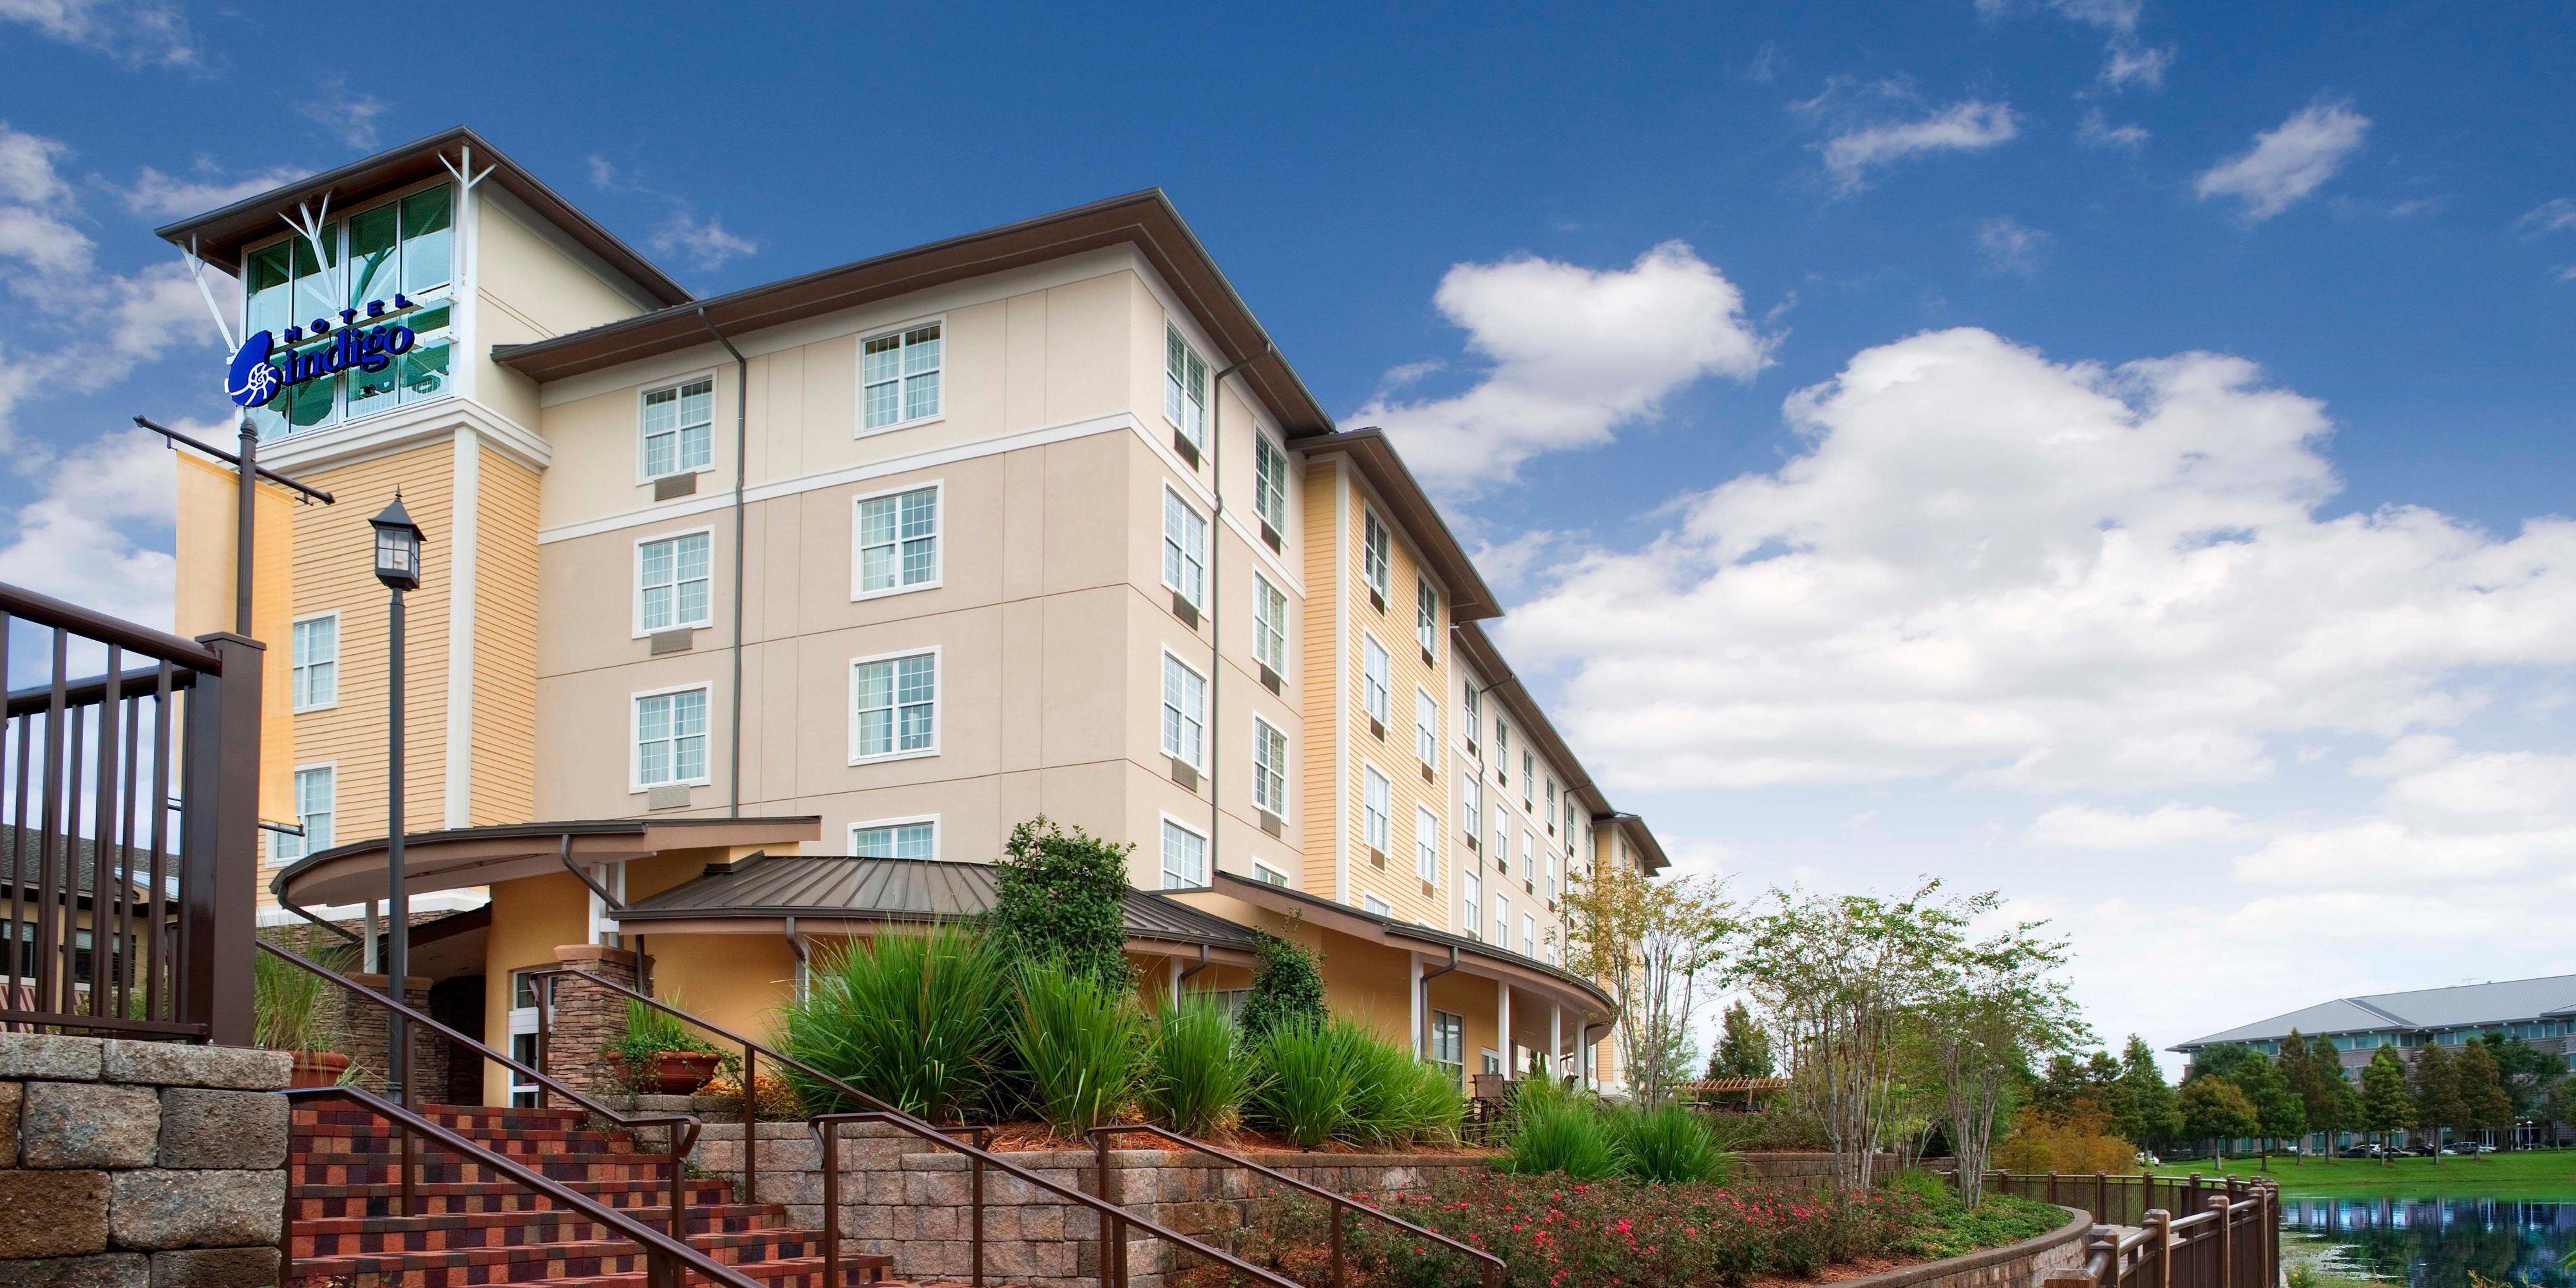 Hotel Indigo Jacksonville-Deerwood Park image 0